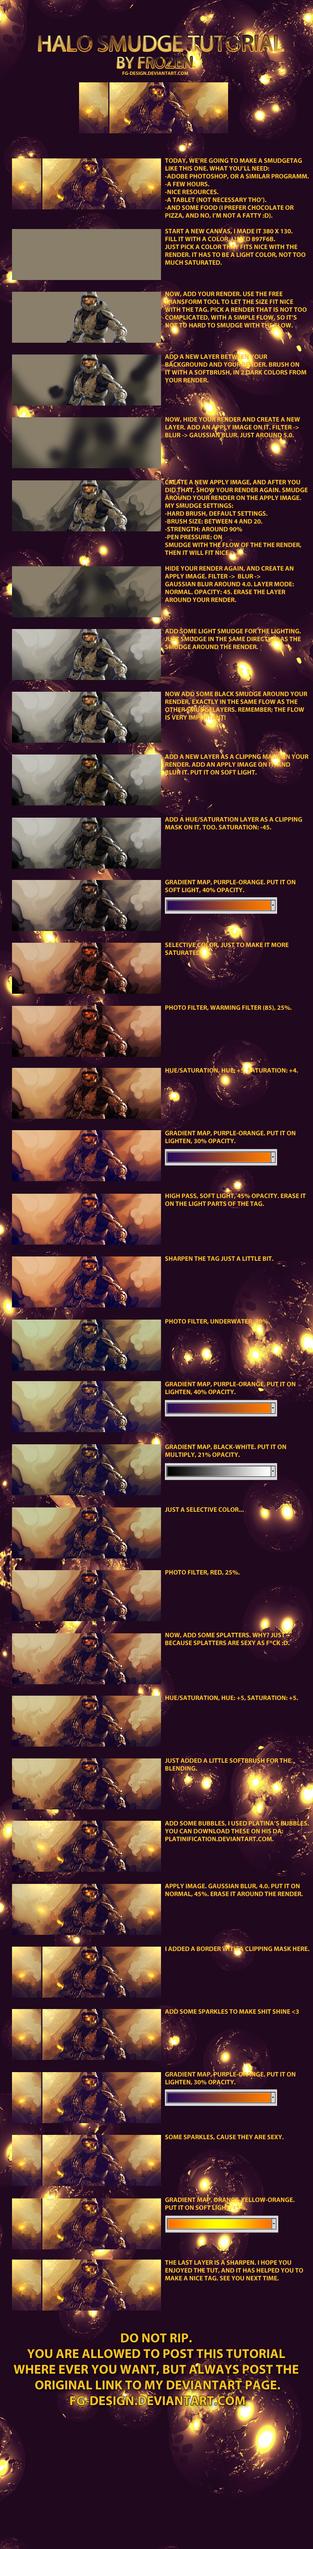 Frozen's Halo smudge tutorial by FG-design